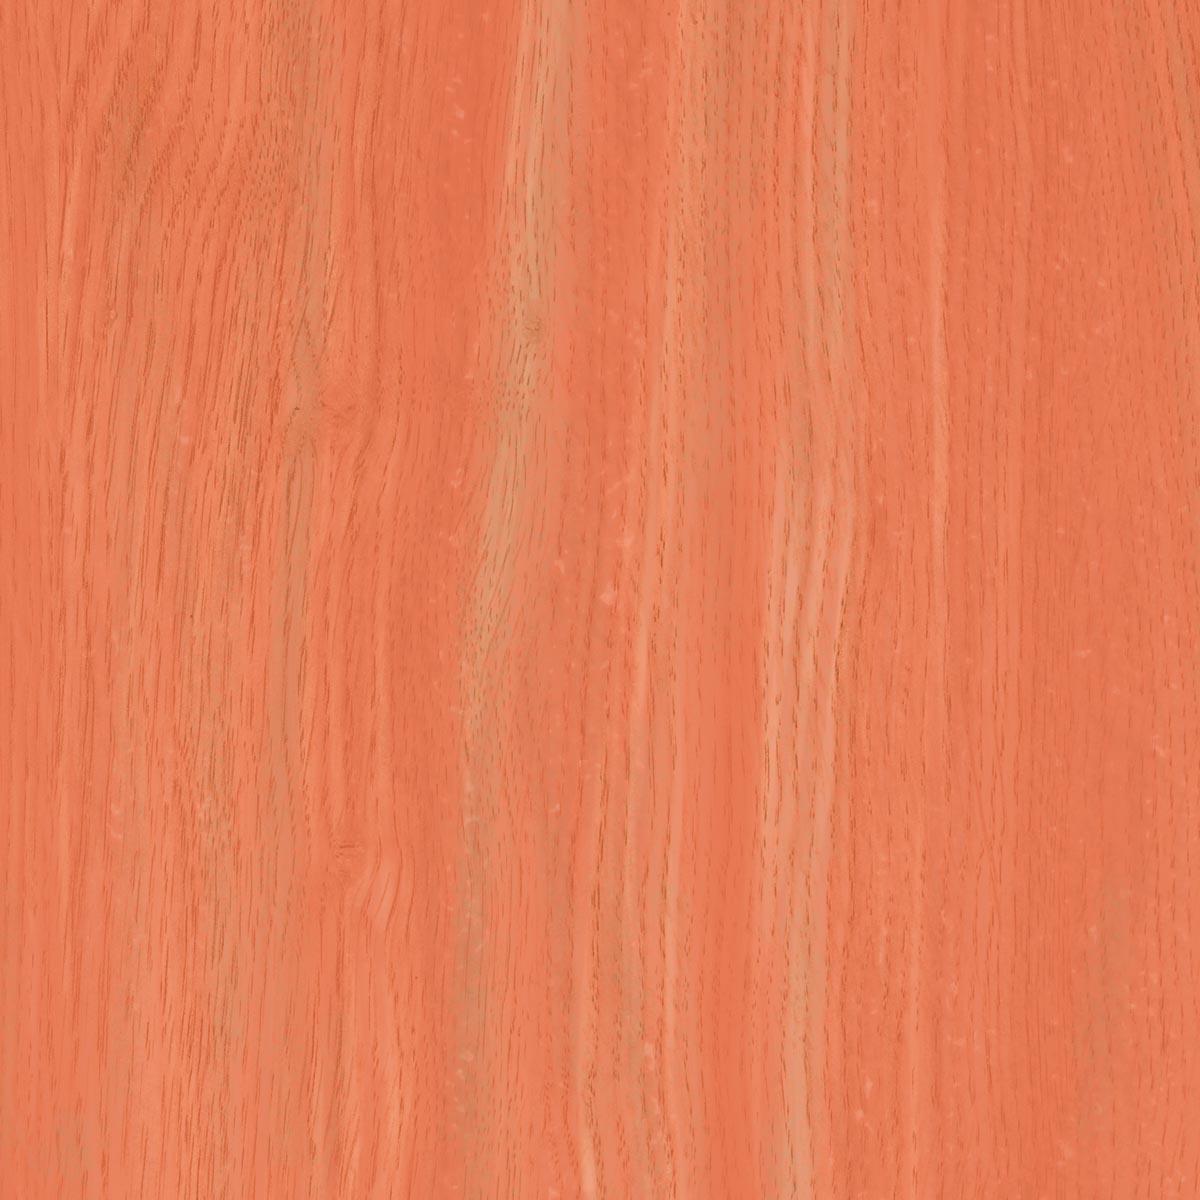 FolkArt ® Pickling Wash™ - Coral Beauty, 8 oz.